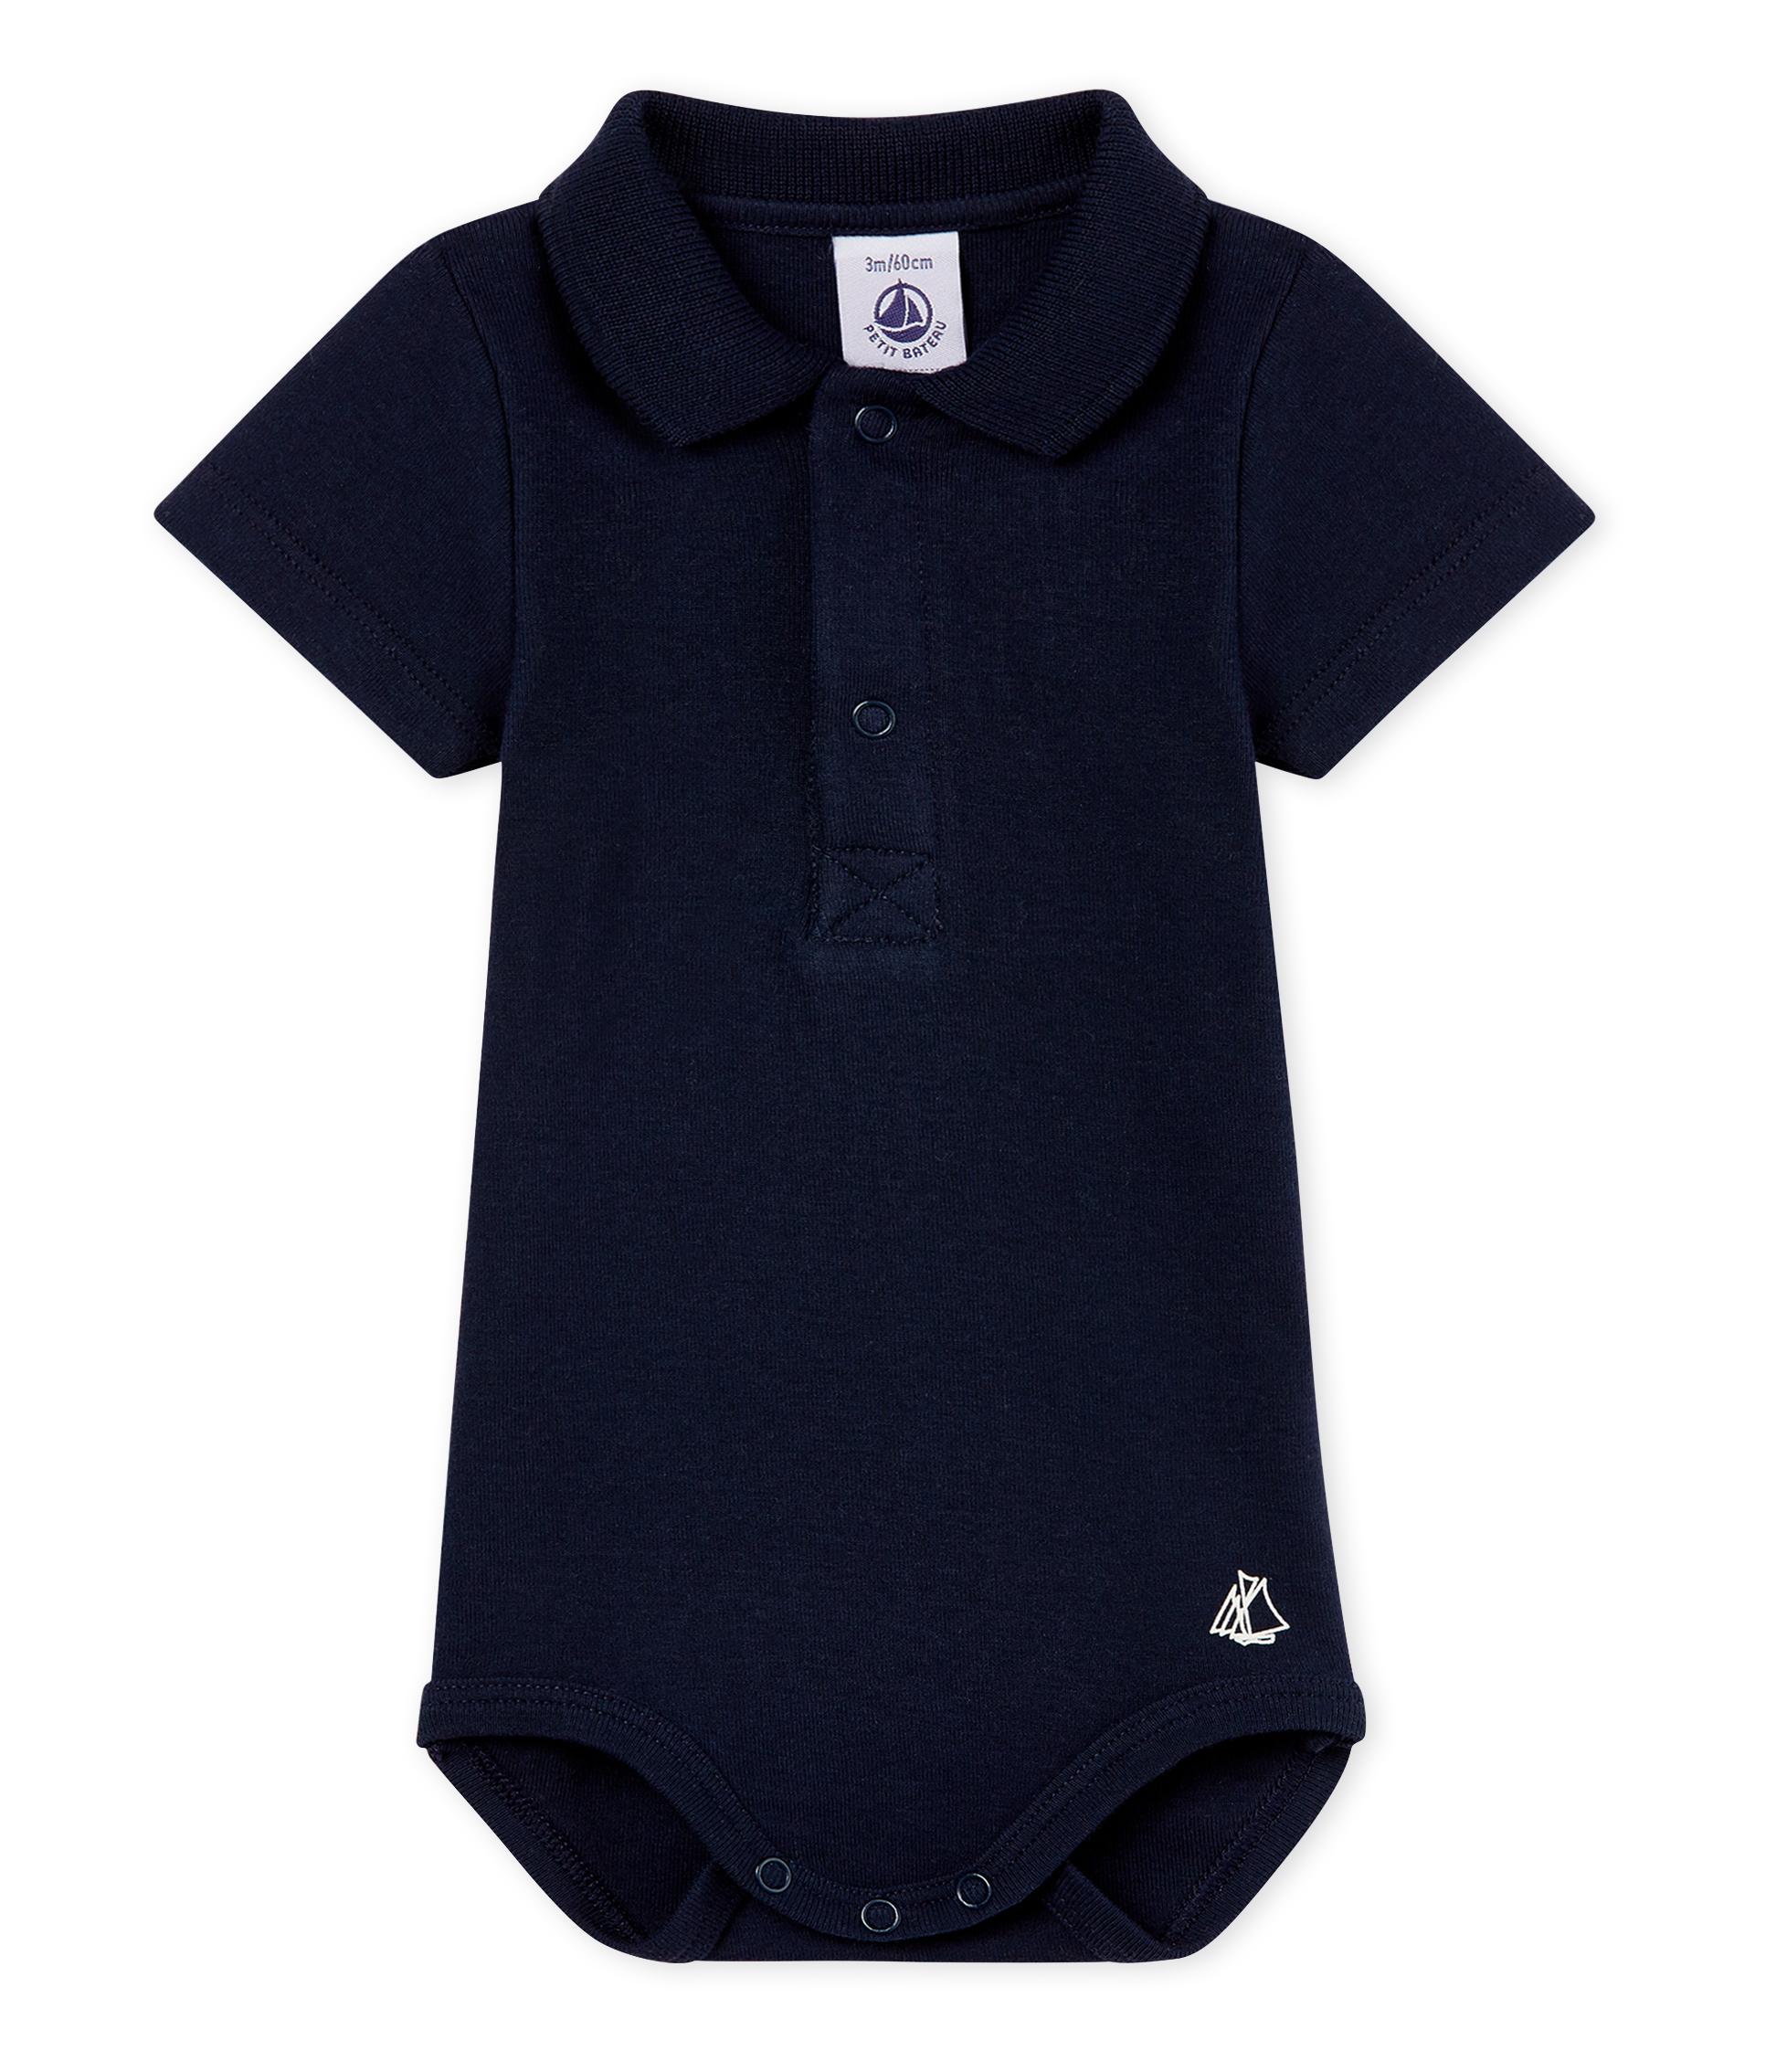 Body manga corta cuello polo liso para bebé niño 3f6080ca8165